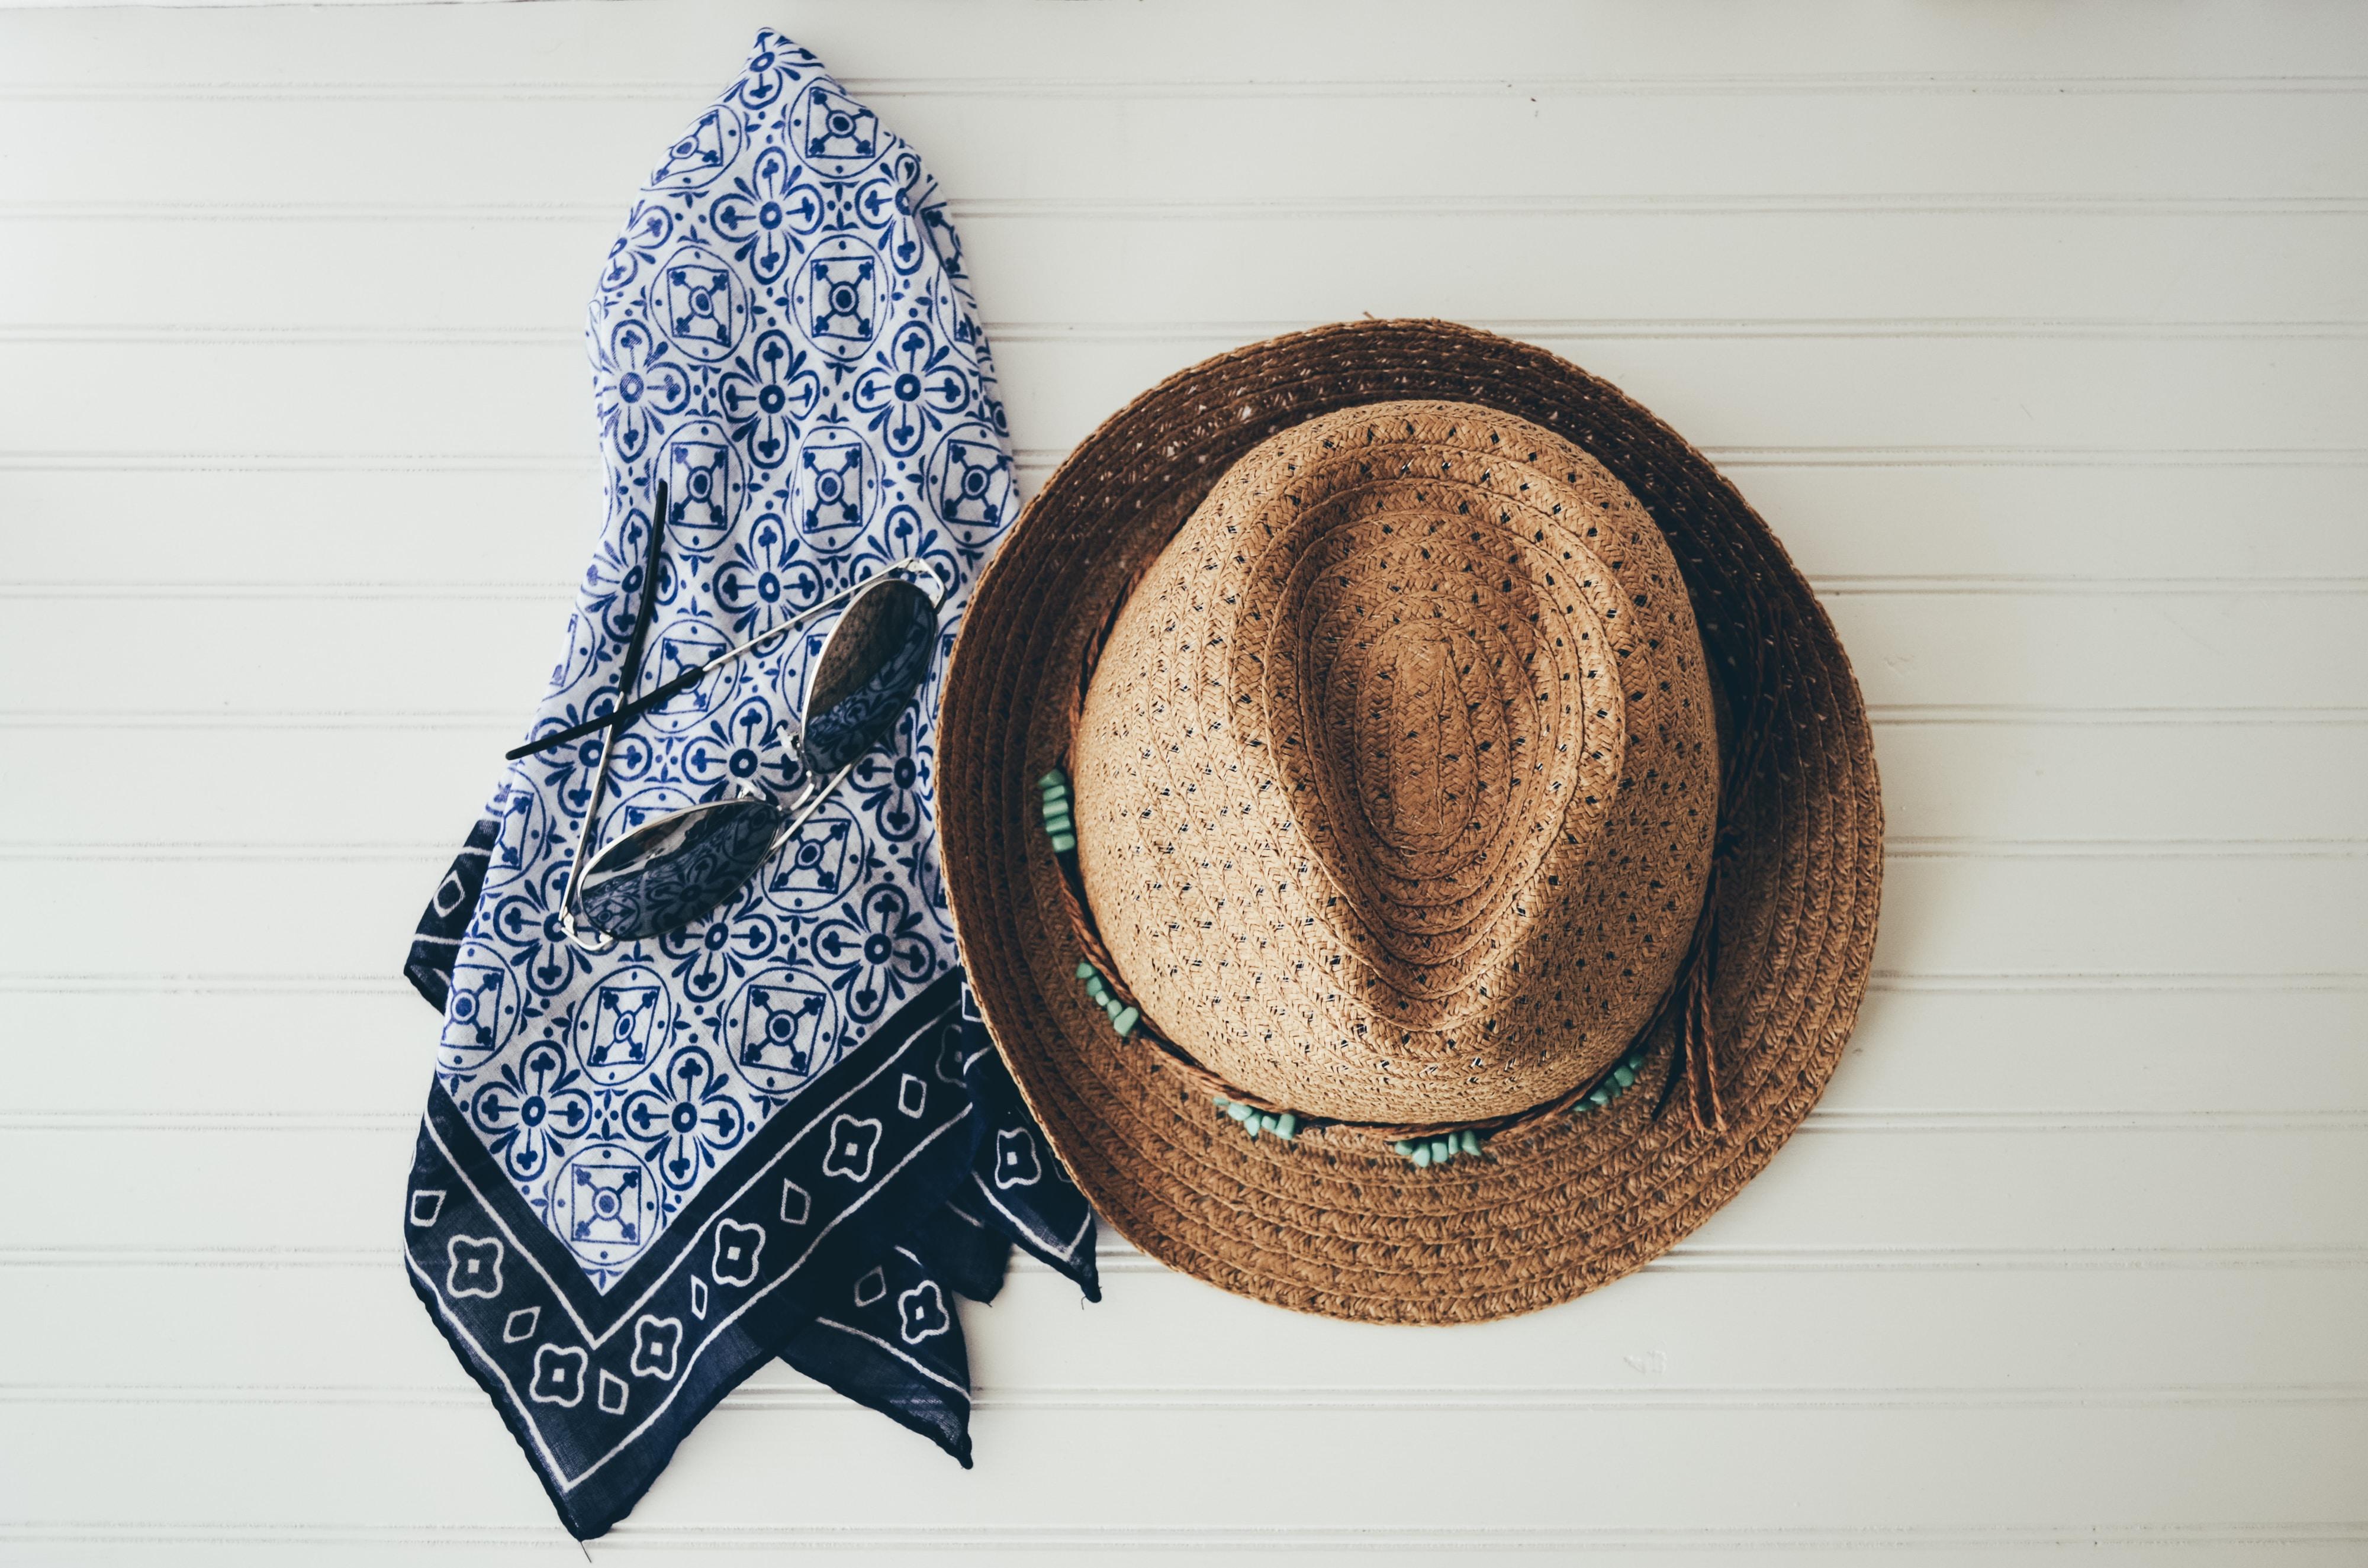 brown hat beside black handkerchief